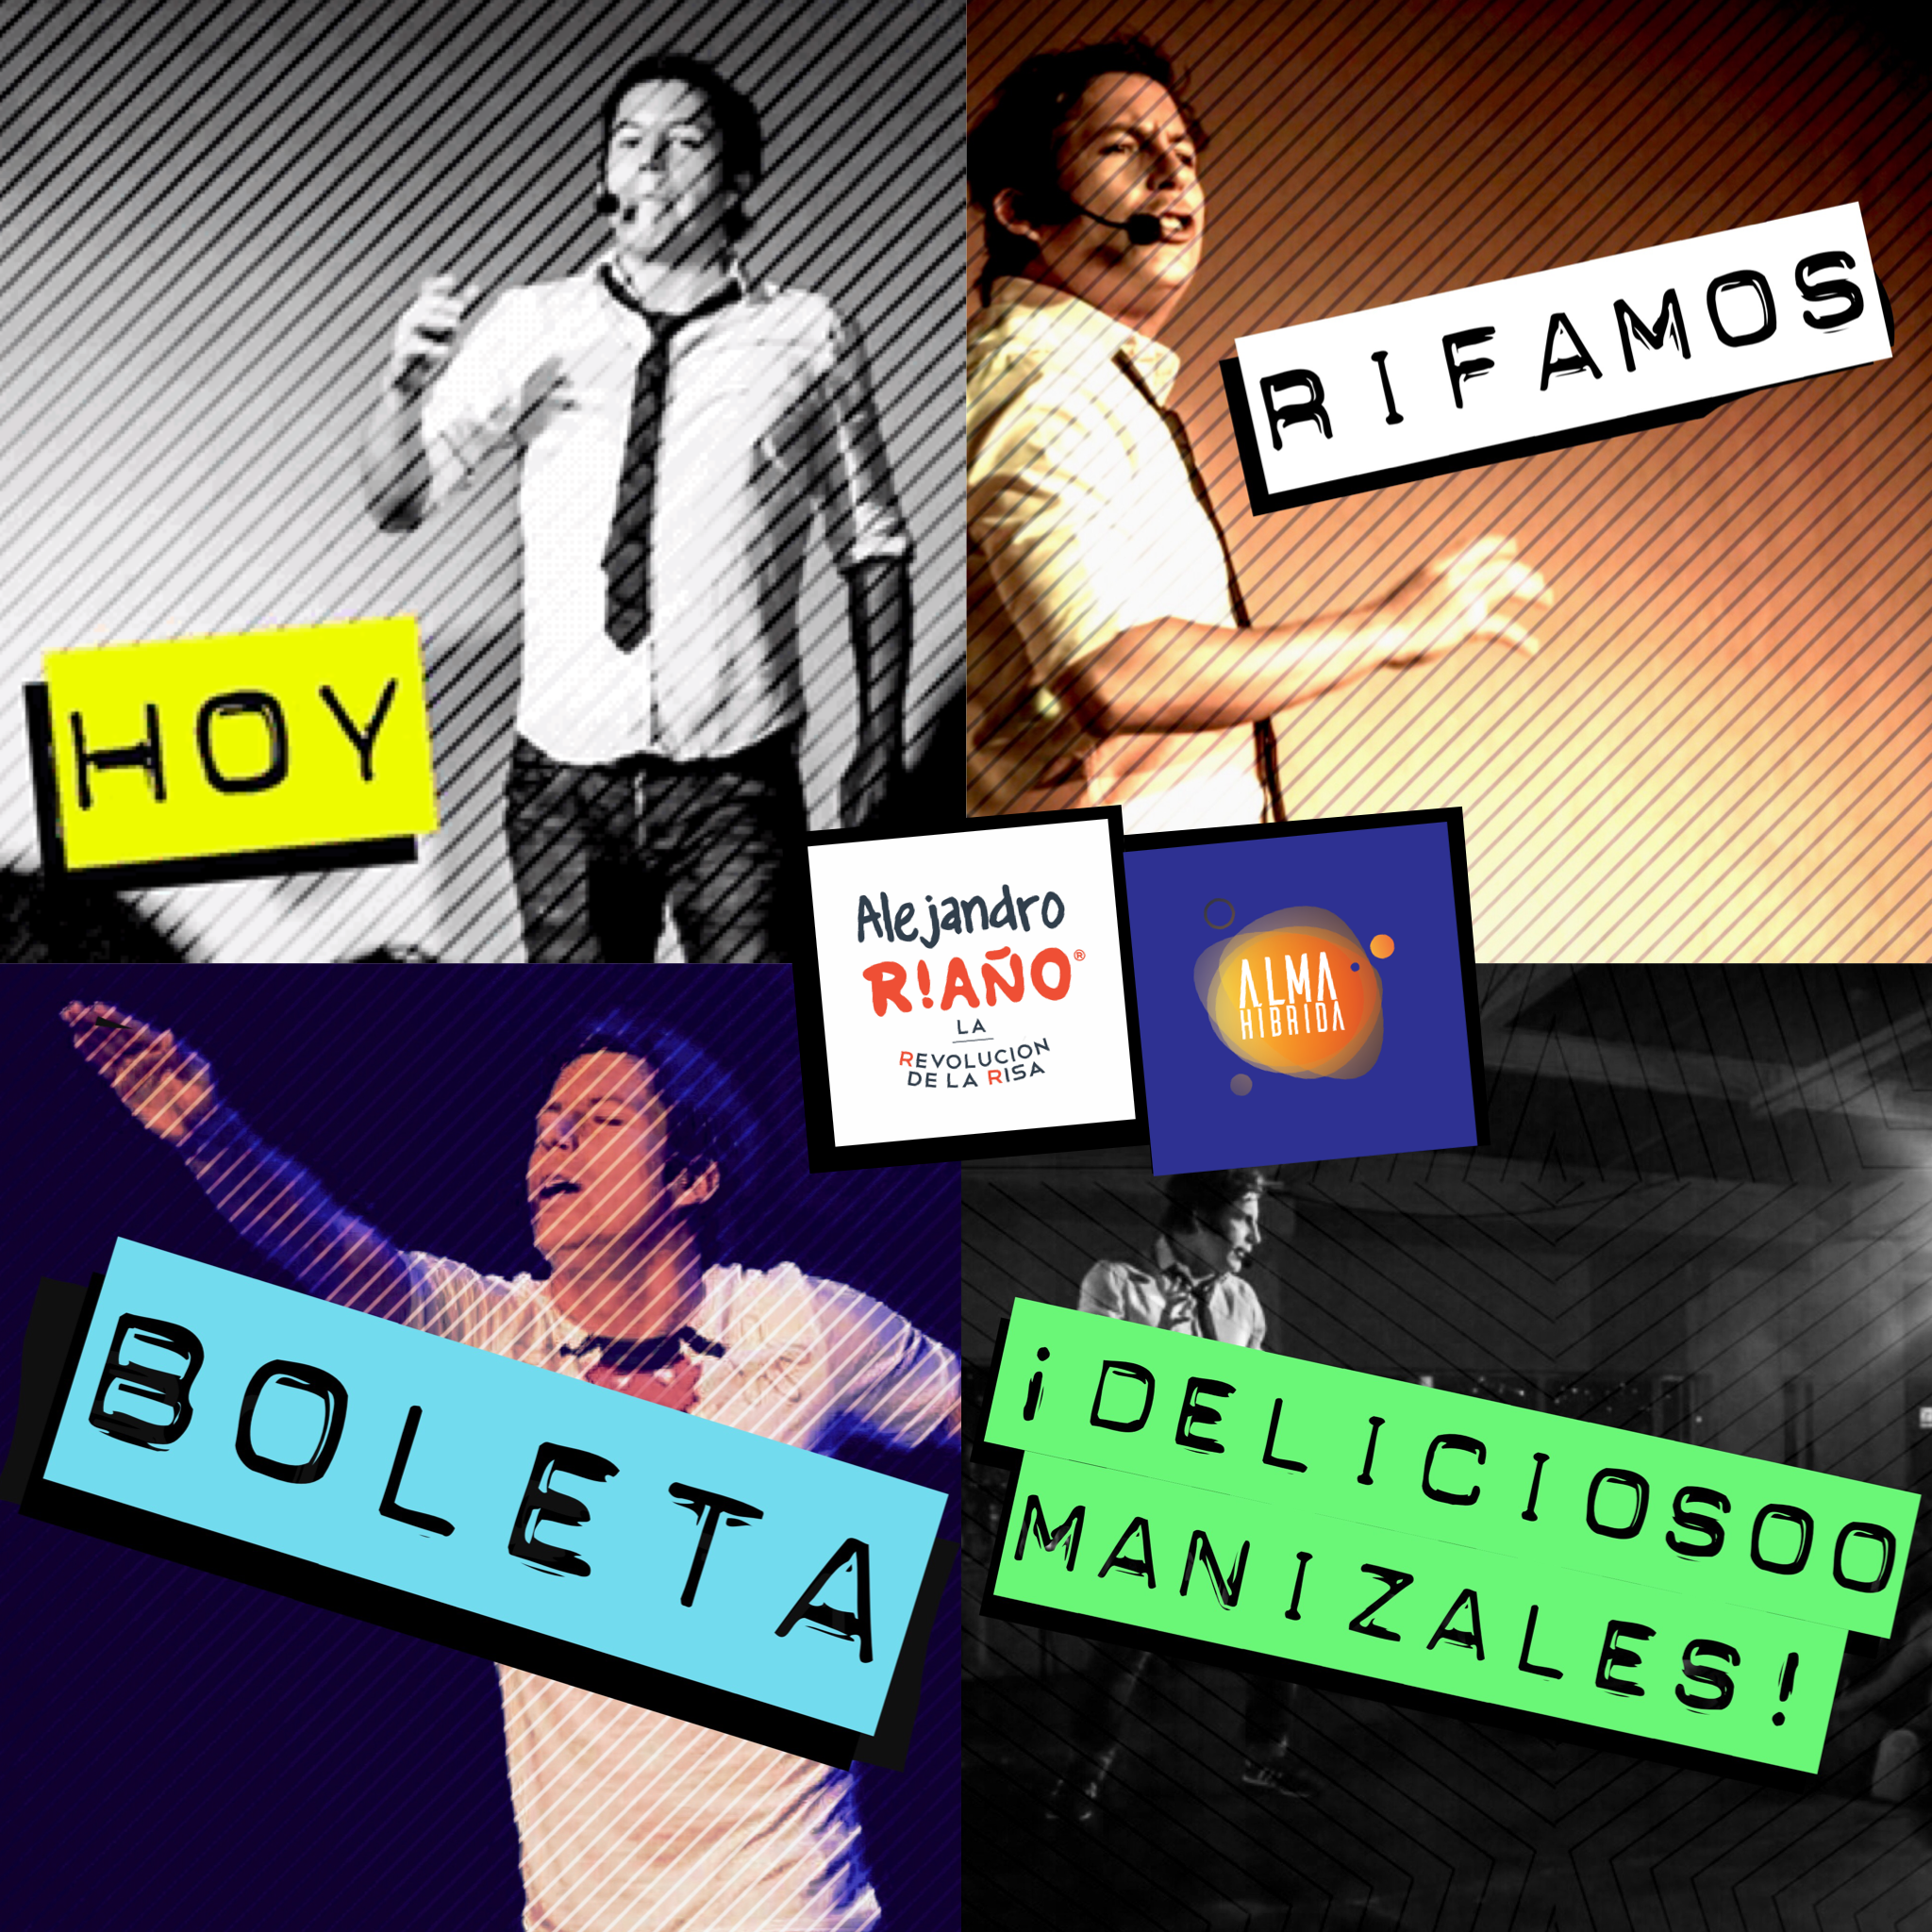 Riaño_-_Hoy_Rifamos_Boleta.PNG